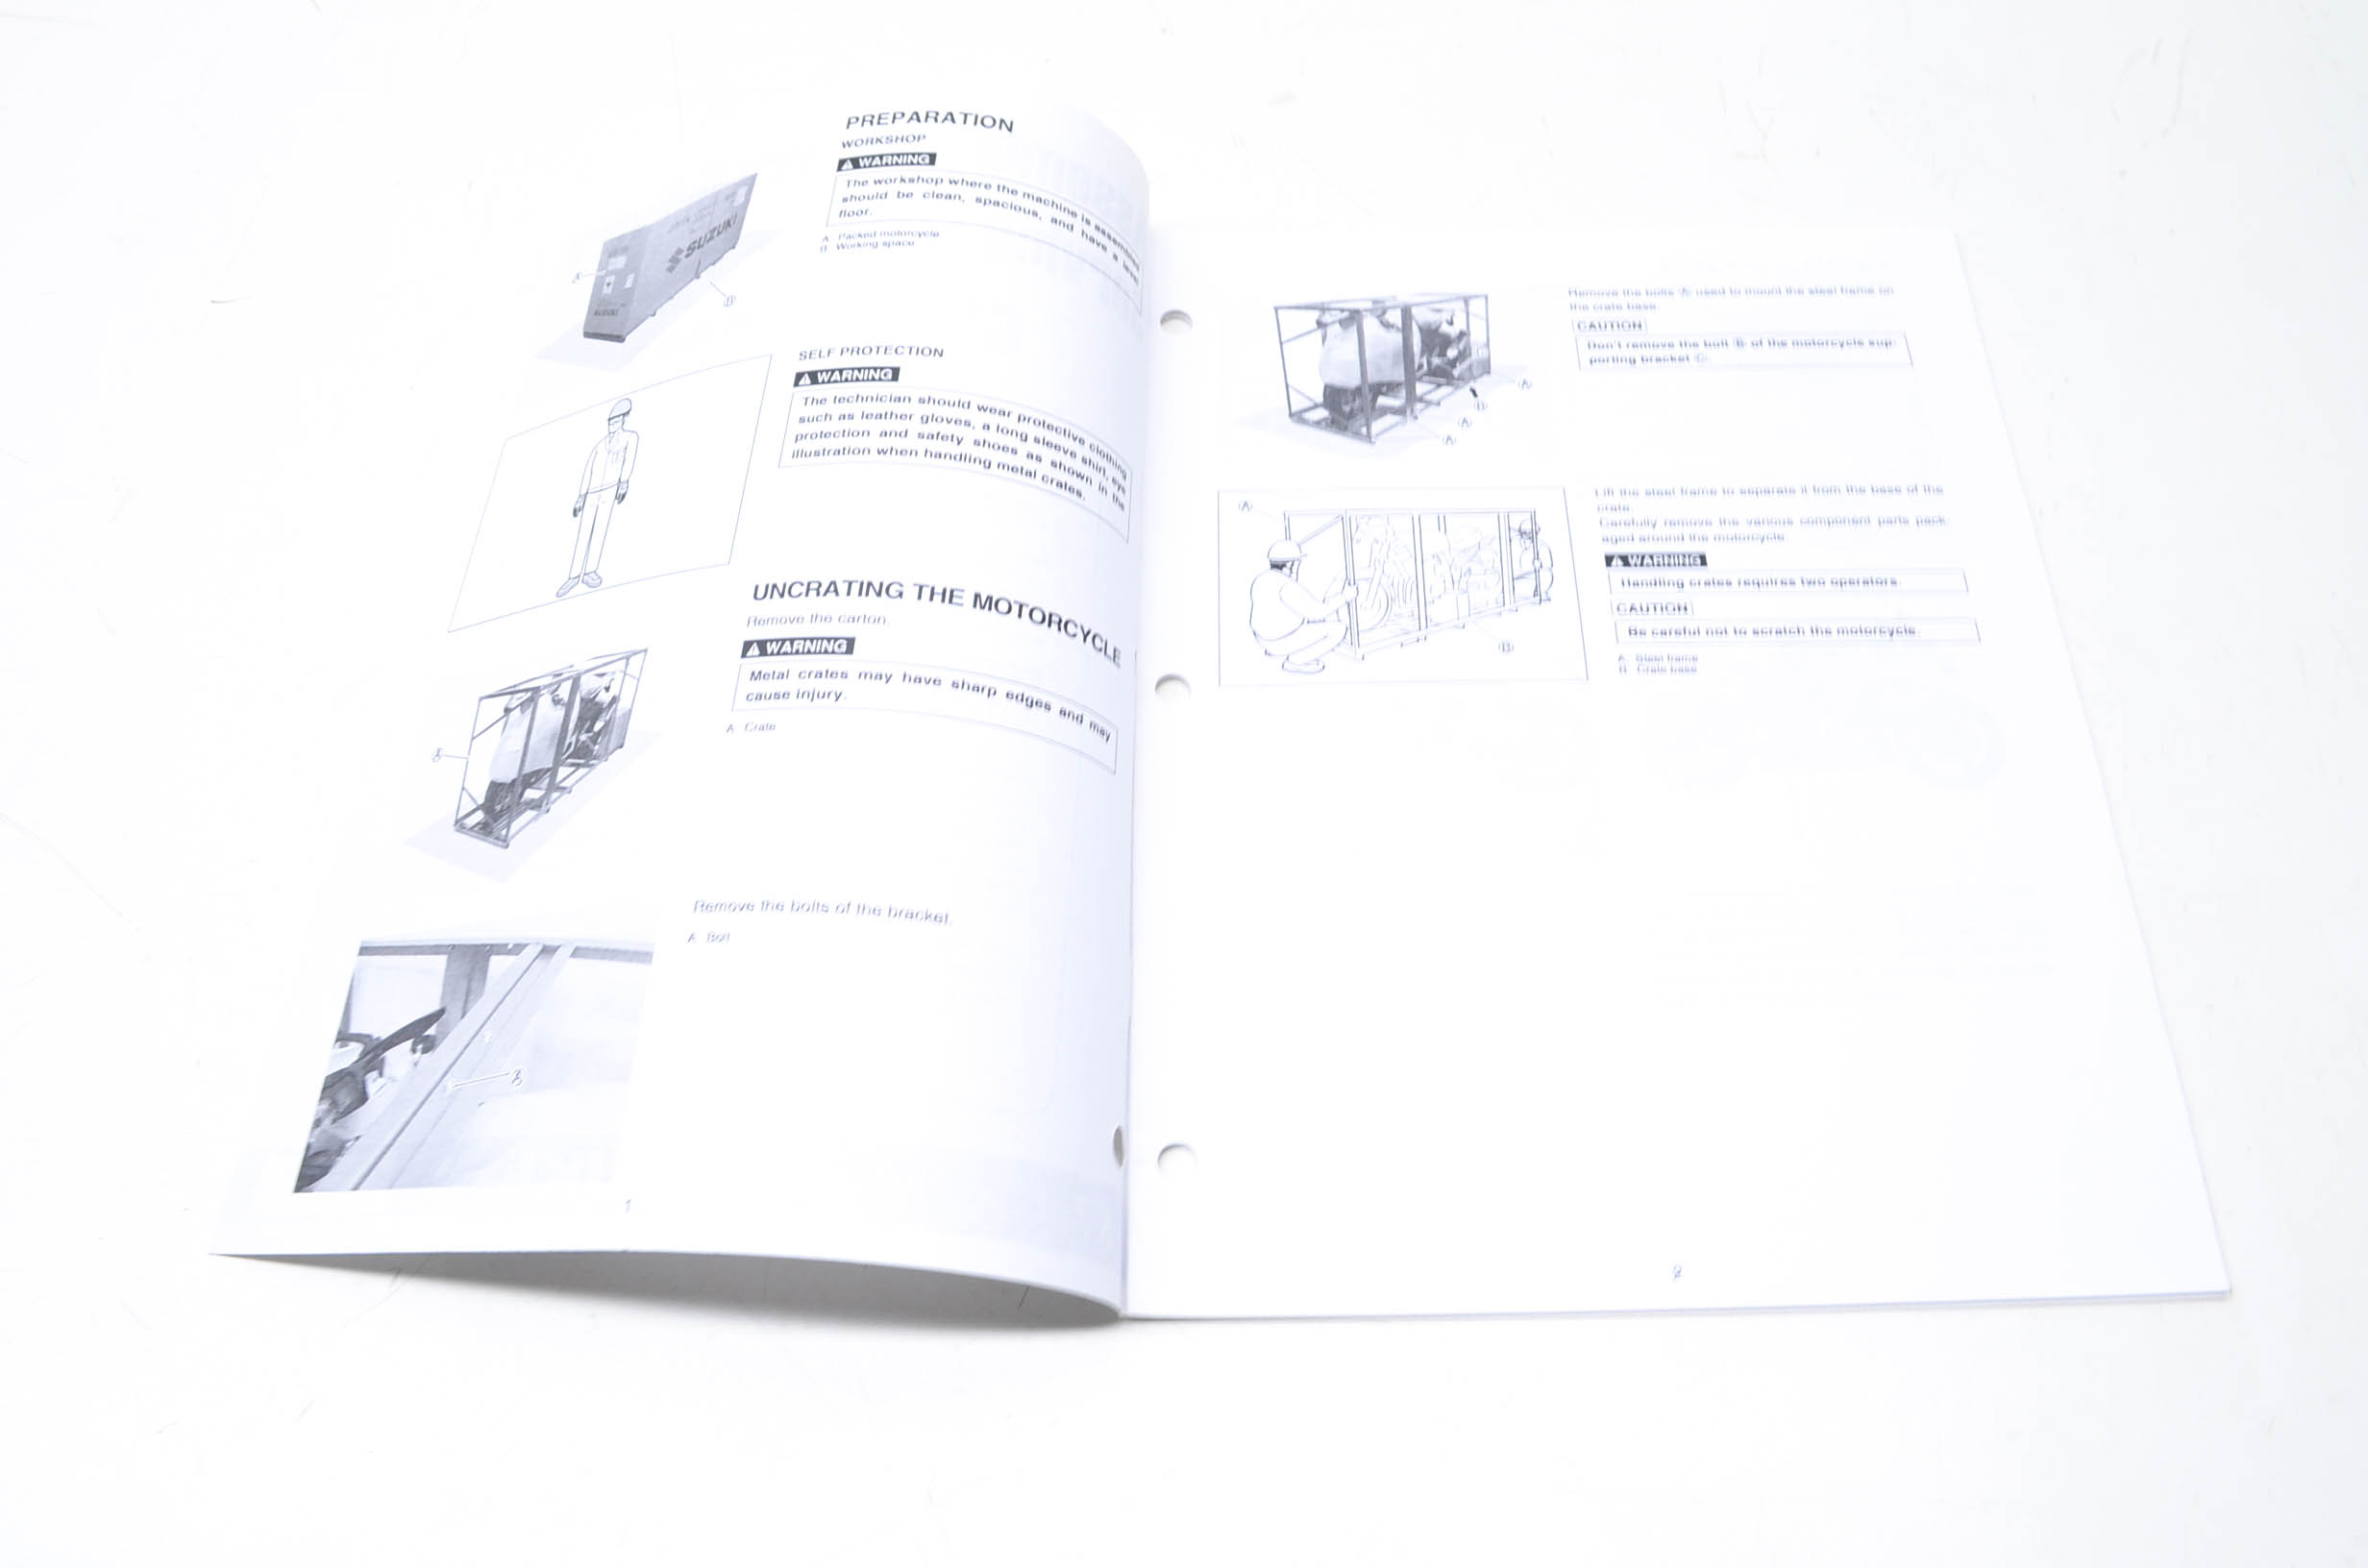 OEM Suzuki 99505-01077-03E GSX-R1000K7 S/U Service Manual